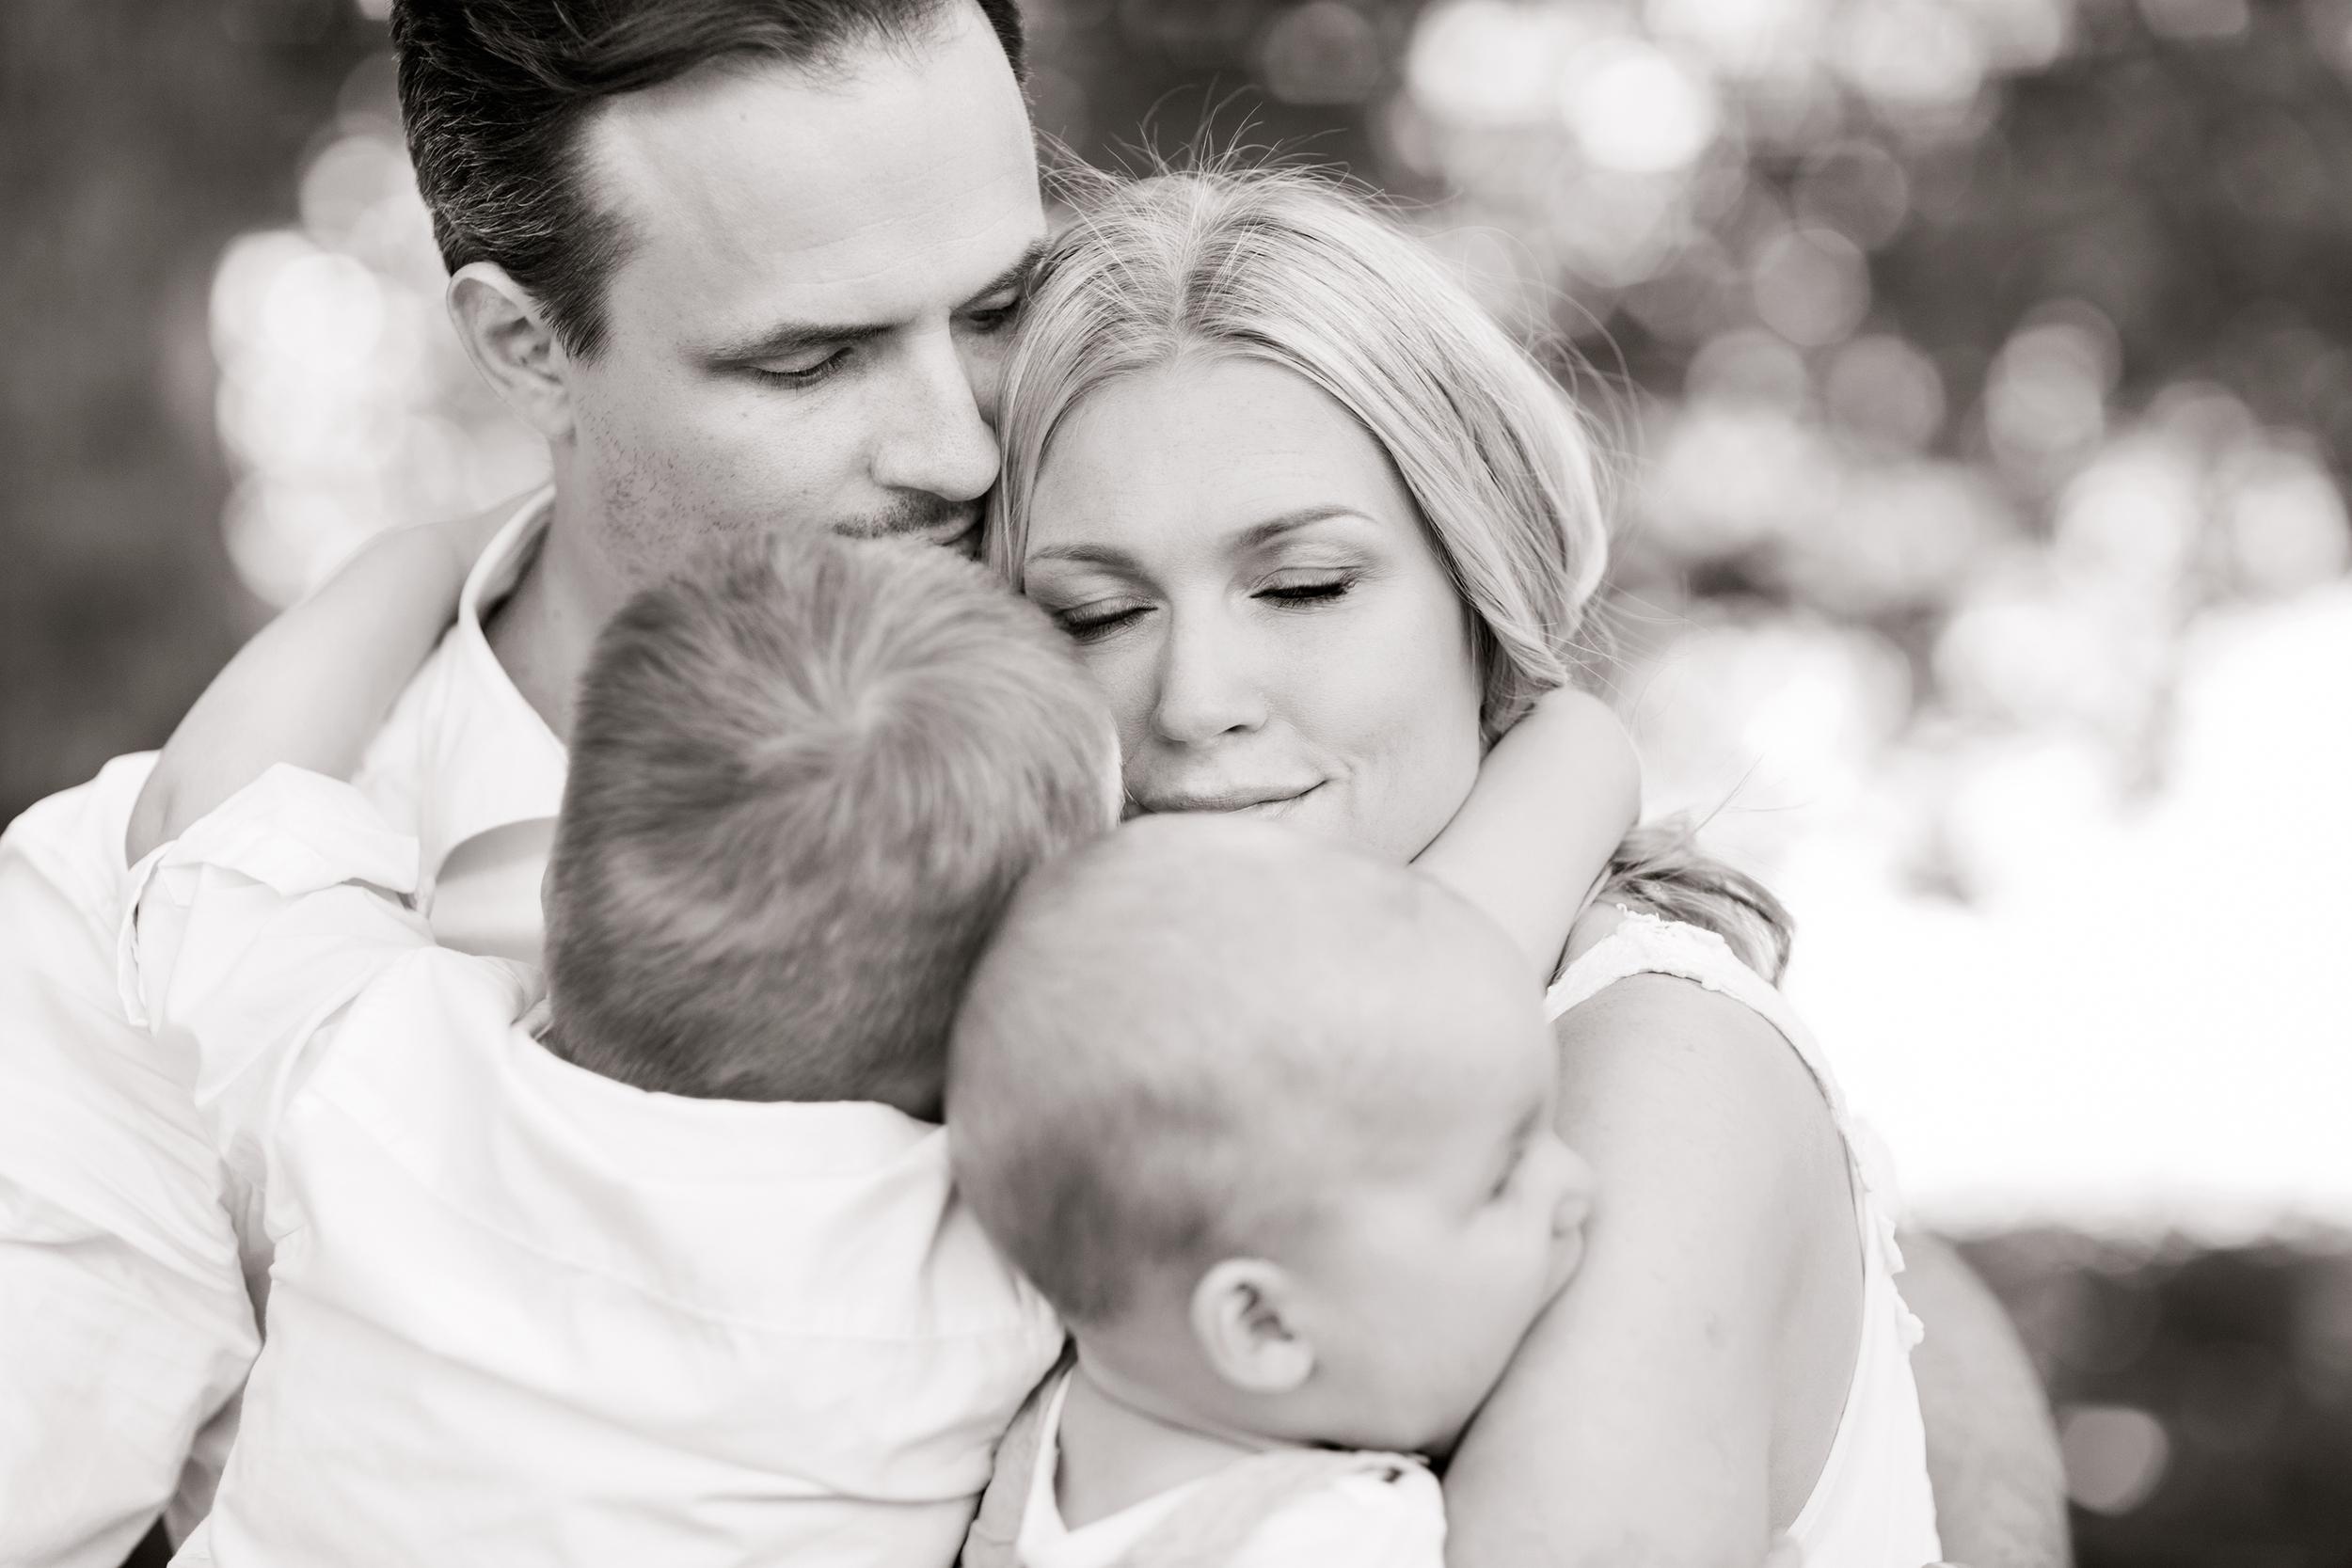 familjefotografering-stockholm-solna-barnfotograf4.jpg